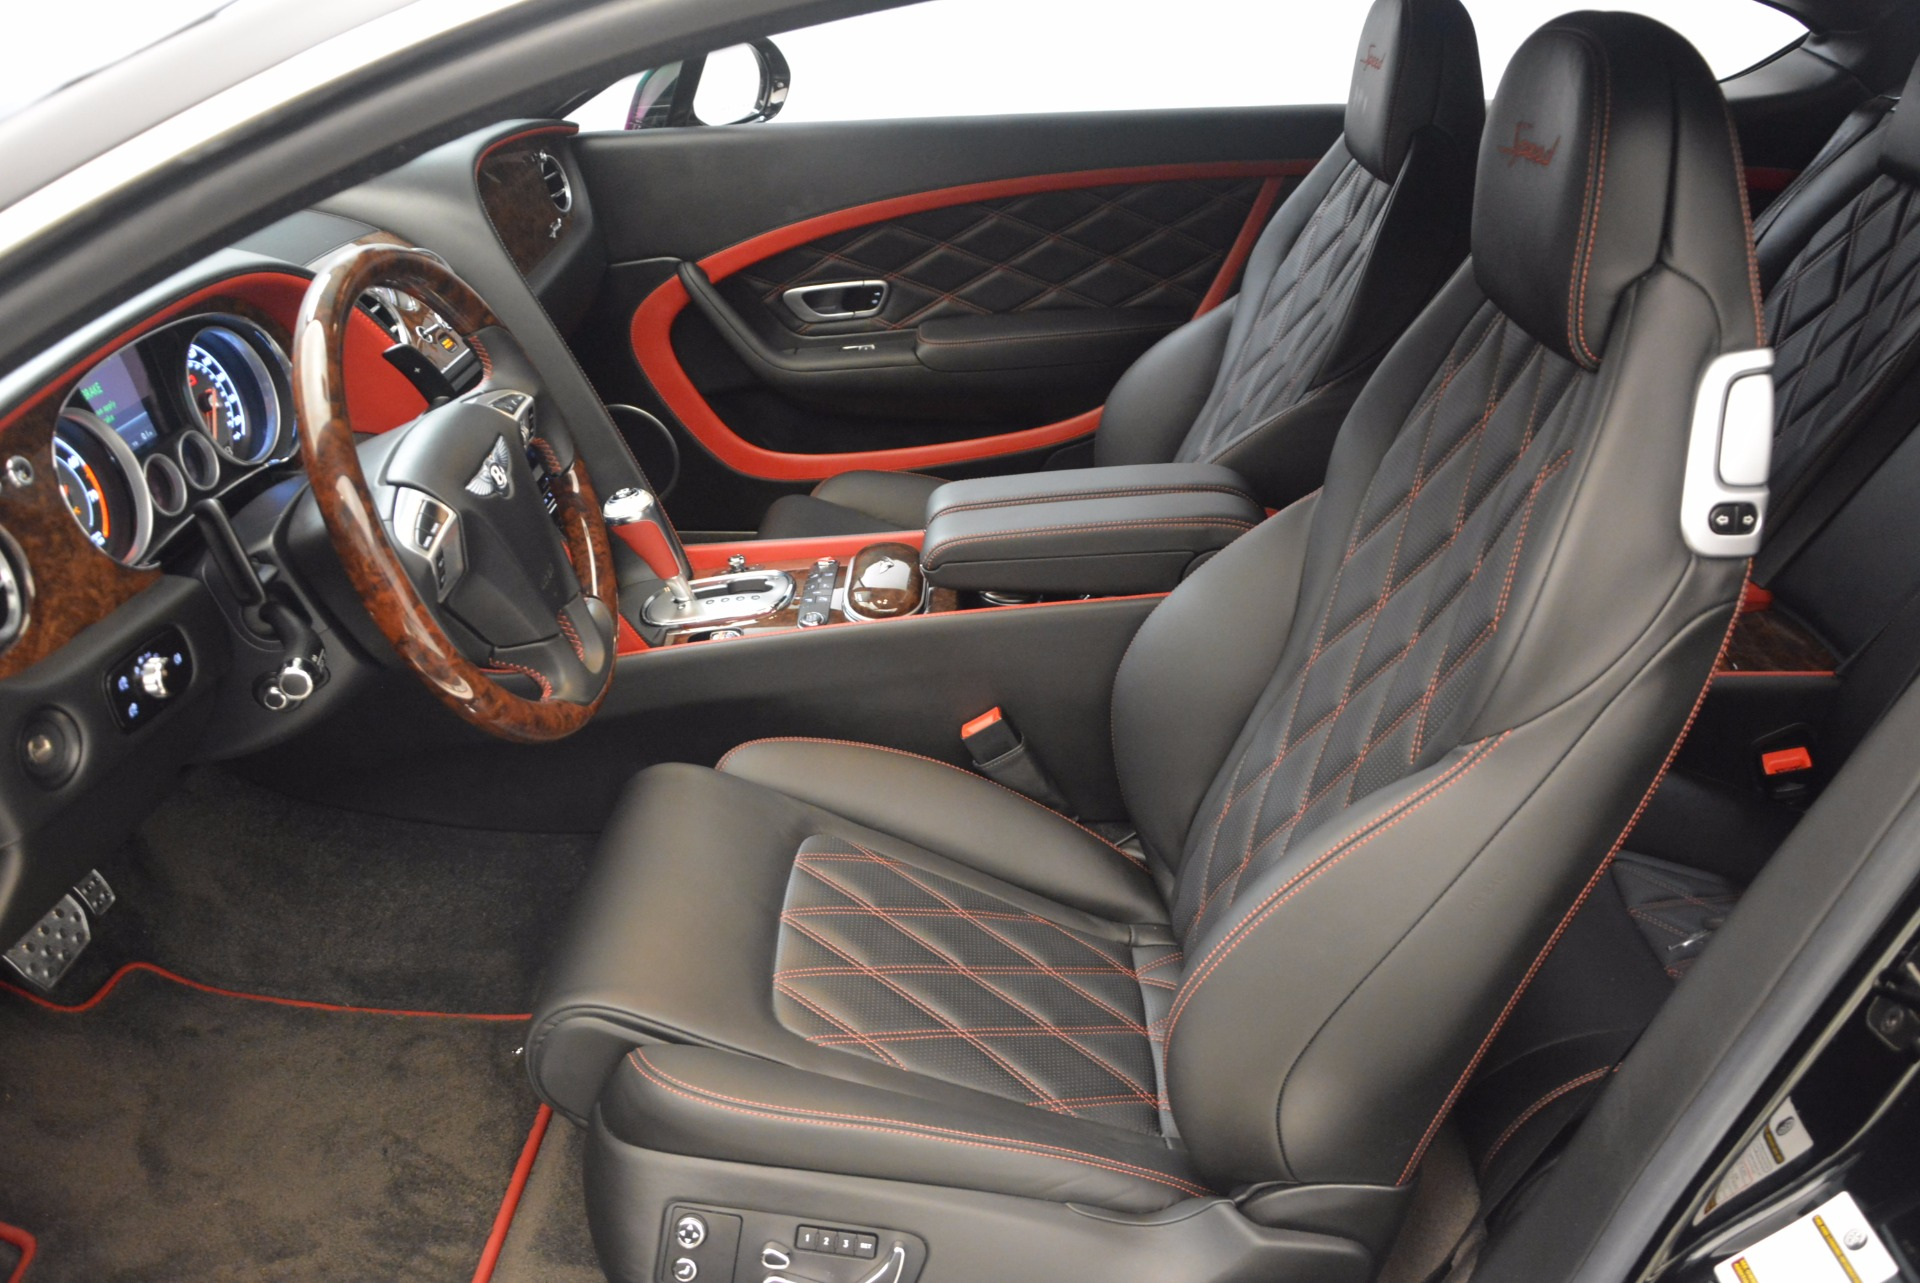 Used 2015 Bentley Continental GT Speed For Sale In Westport, CT 1646_p23